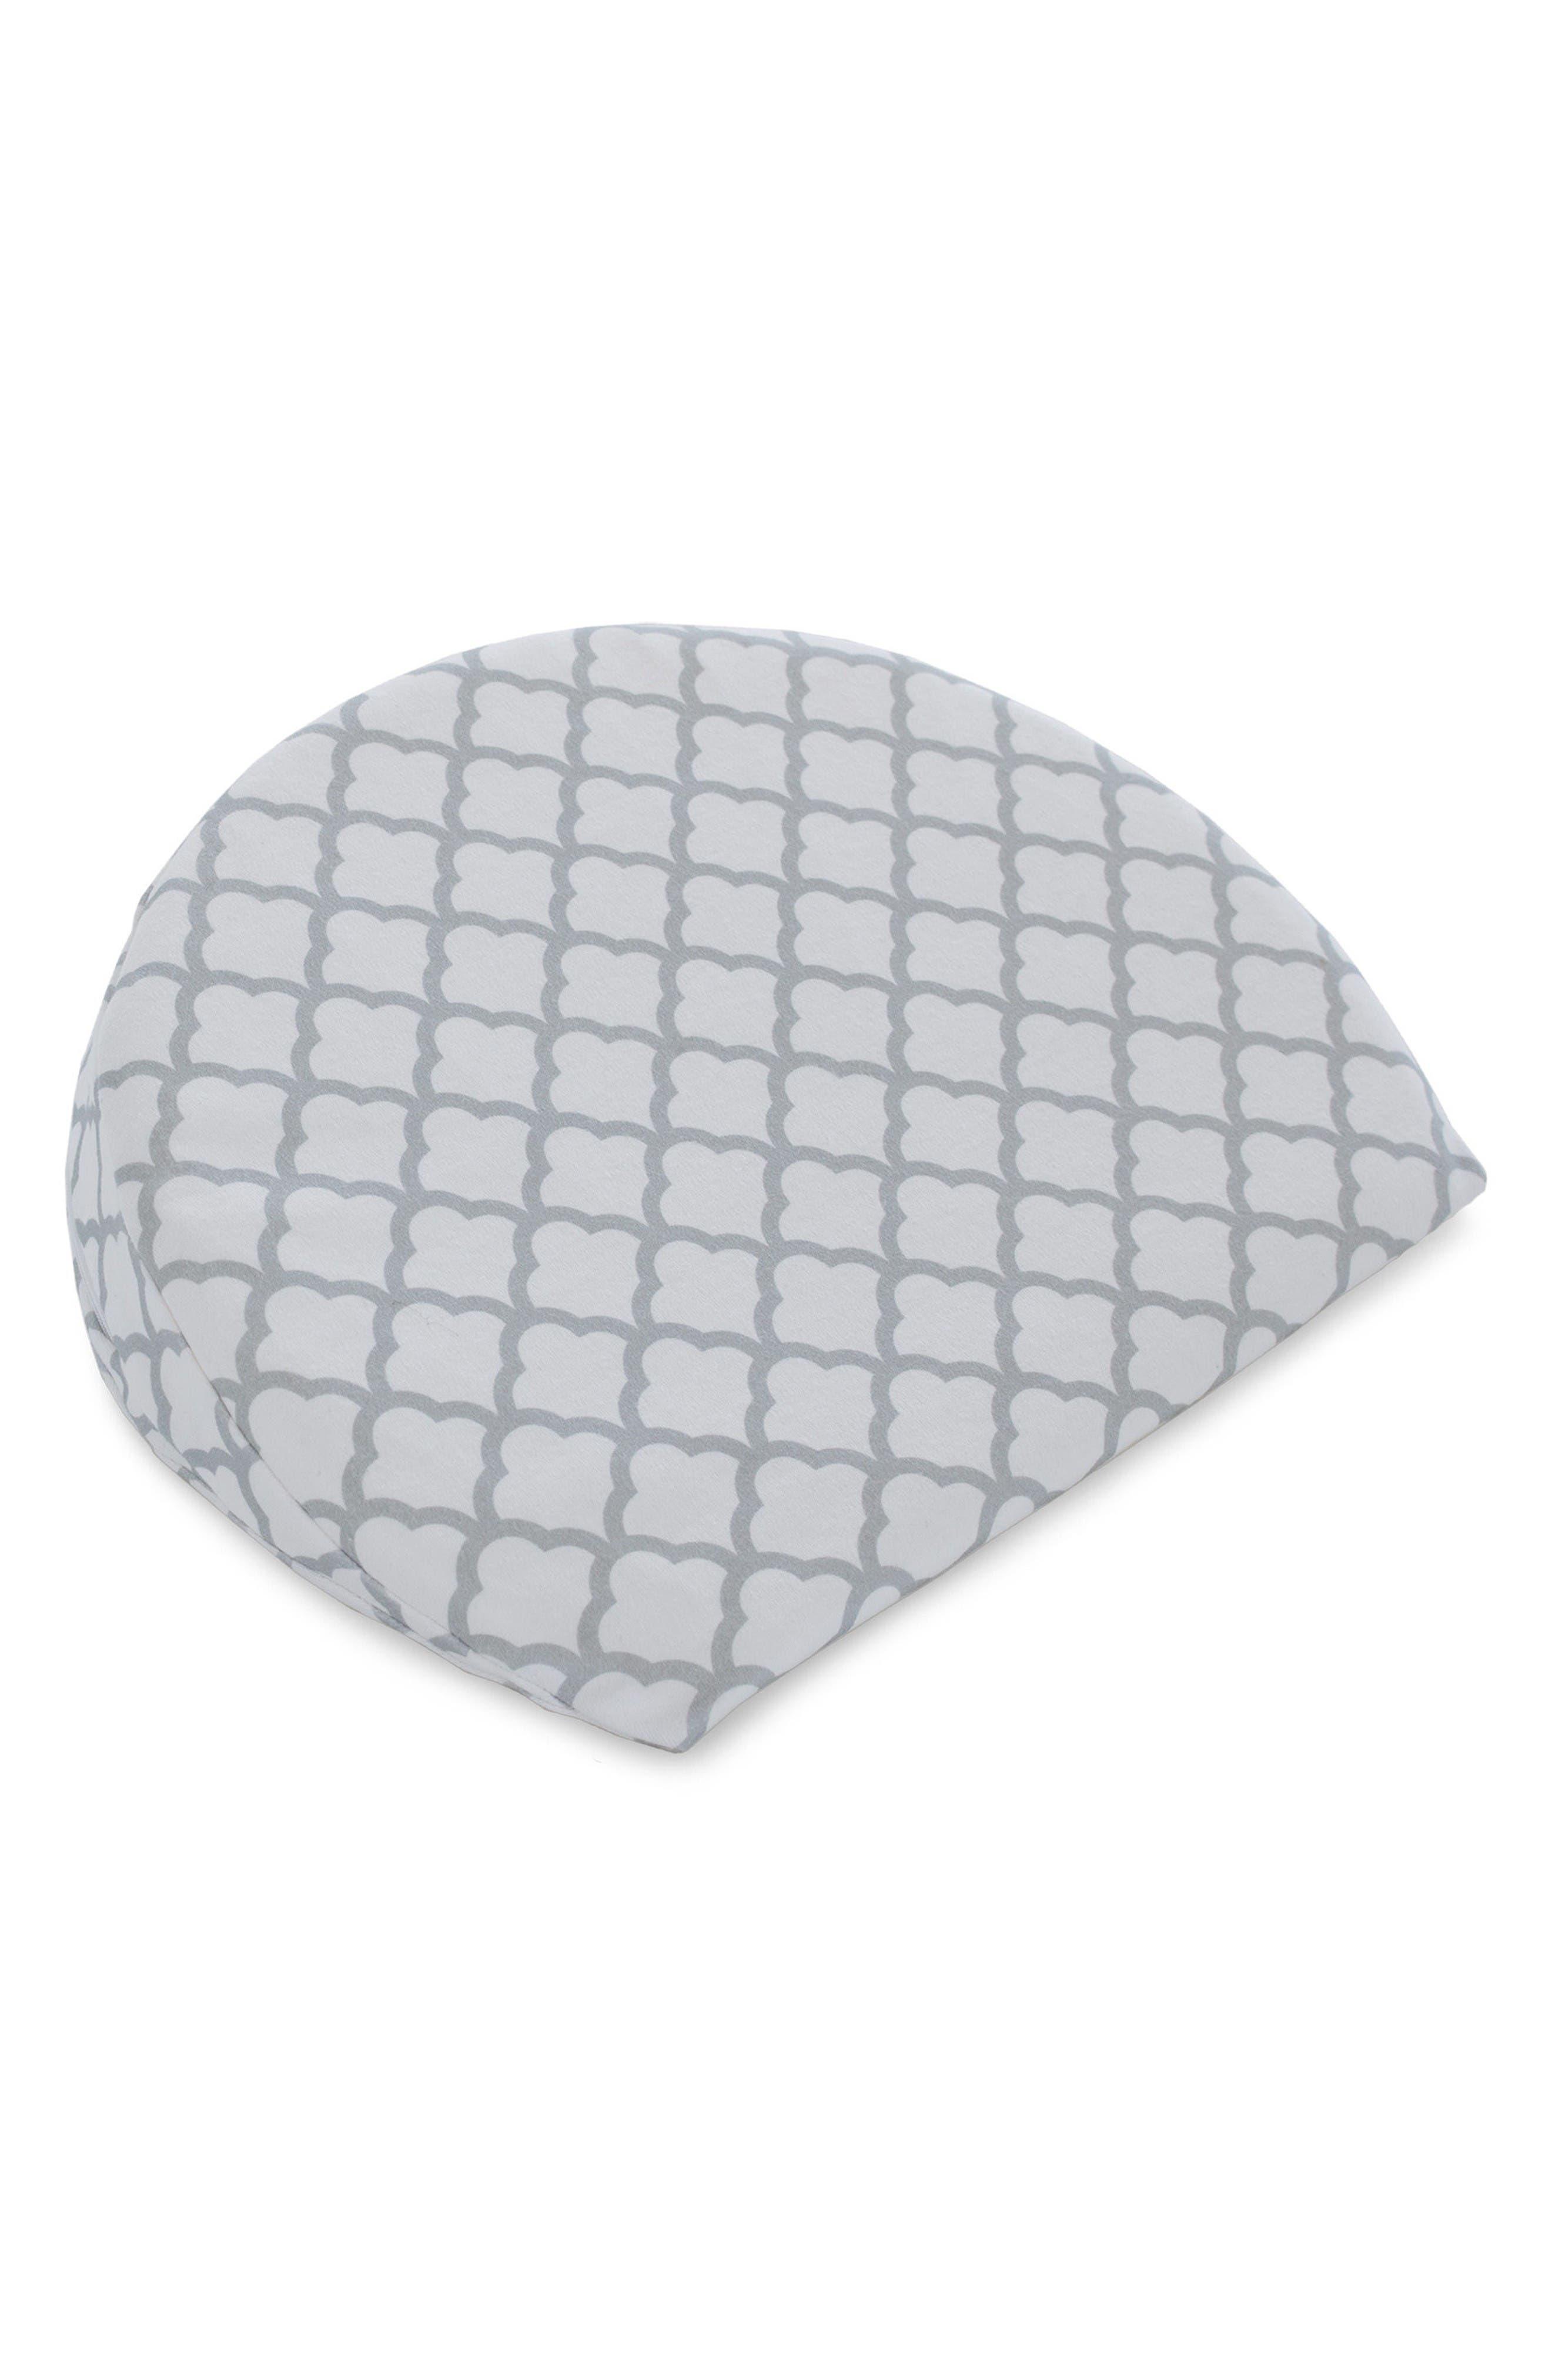 Pregnancy Wedge Cushion & Slipcover,                             Alternate thumbnail 2, color,                             White Trellis